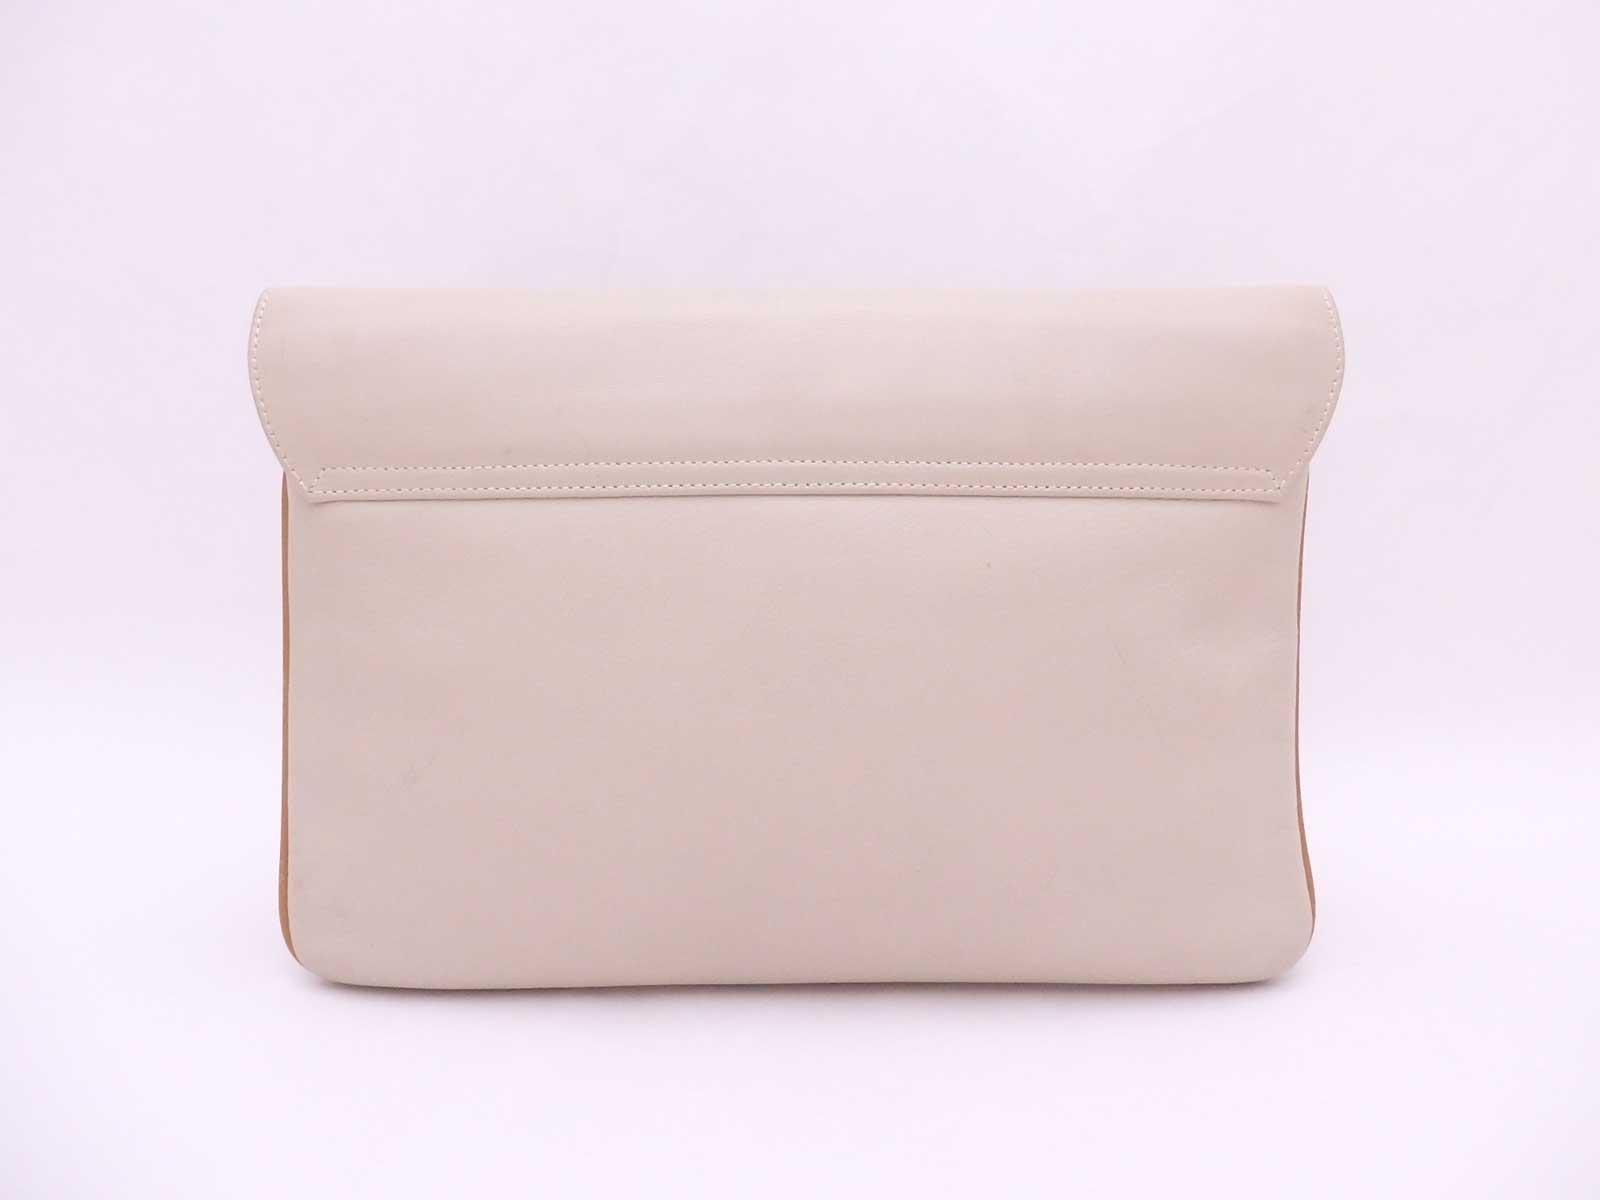 Details about Auth CELINE Logos Clutch Bag Beige Leather Goldtone - e38794 8aa01be0219d4